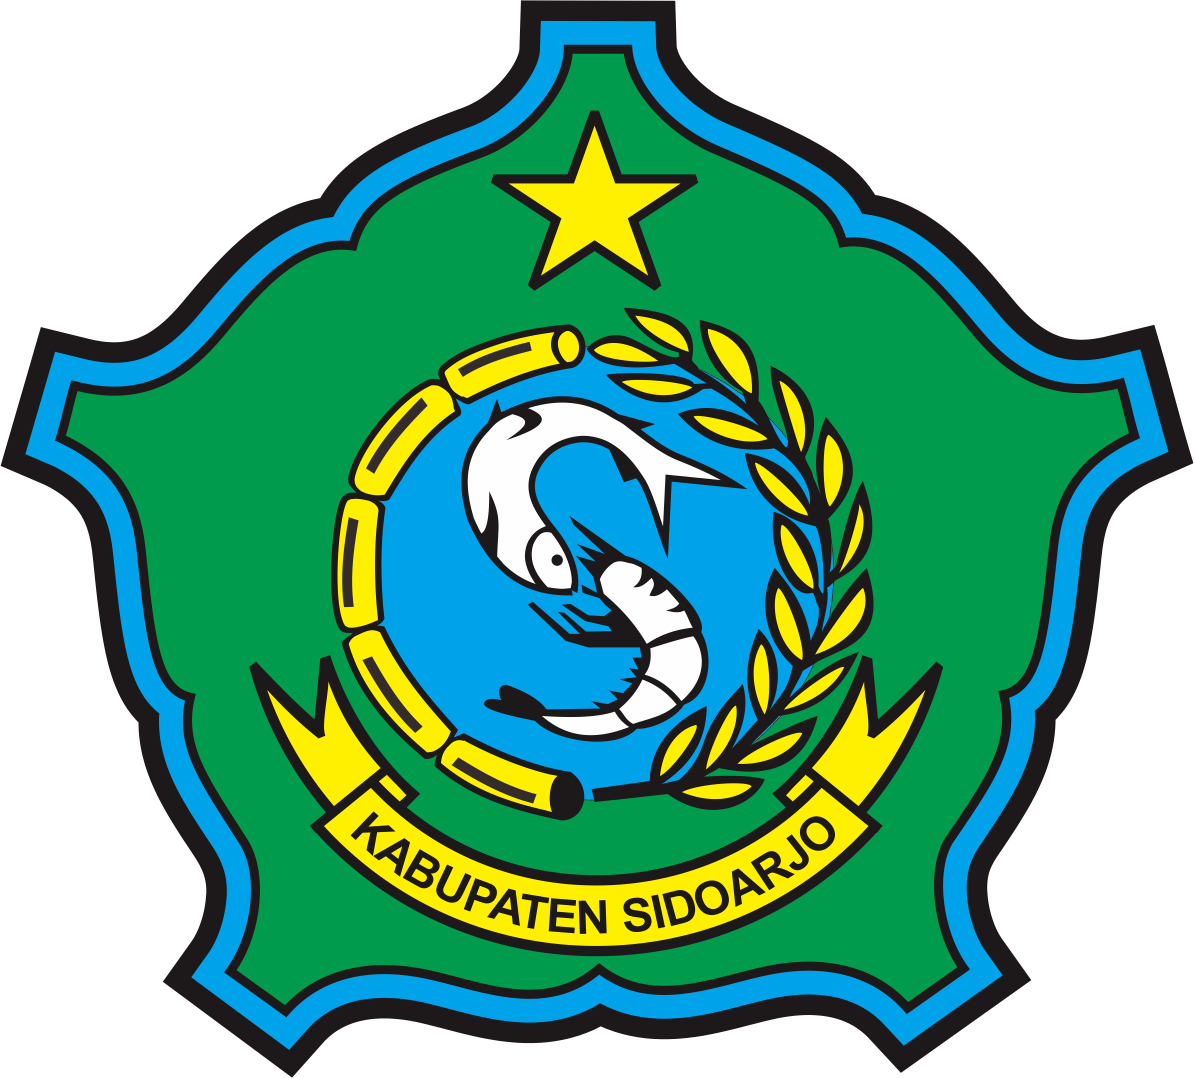 logo kabupaten sidoarjo infoSda Pendidikan, Riwayat